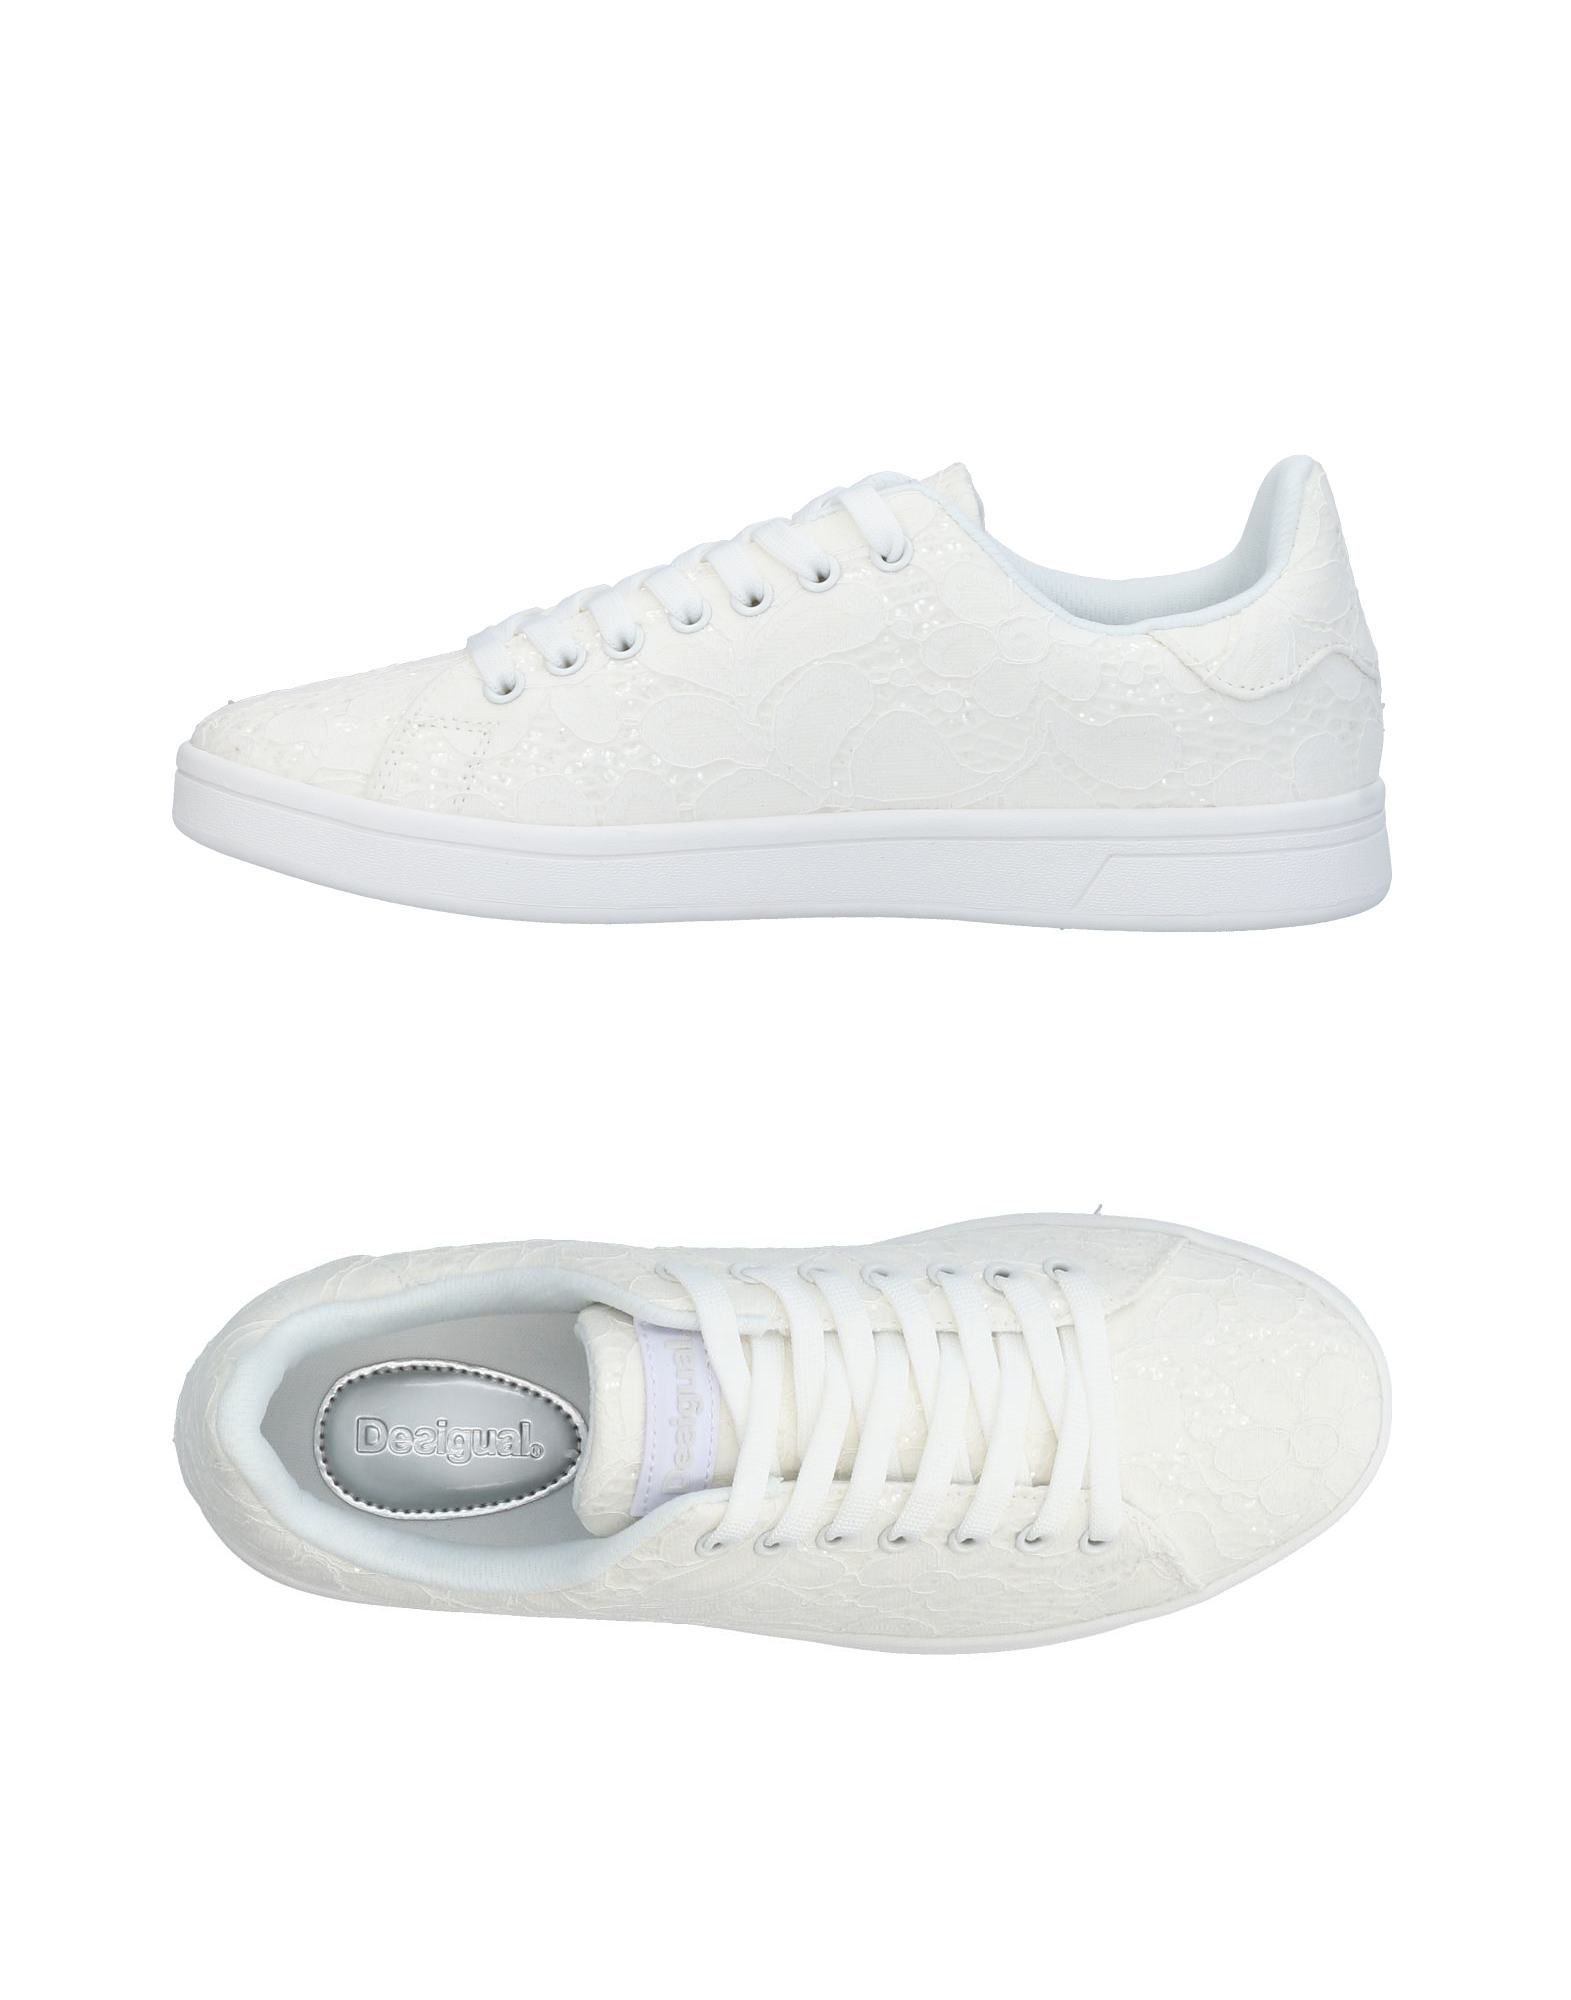 Günstige und modische Schuhe Desigual Sneakers Damen  11439181OU